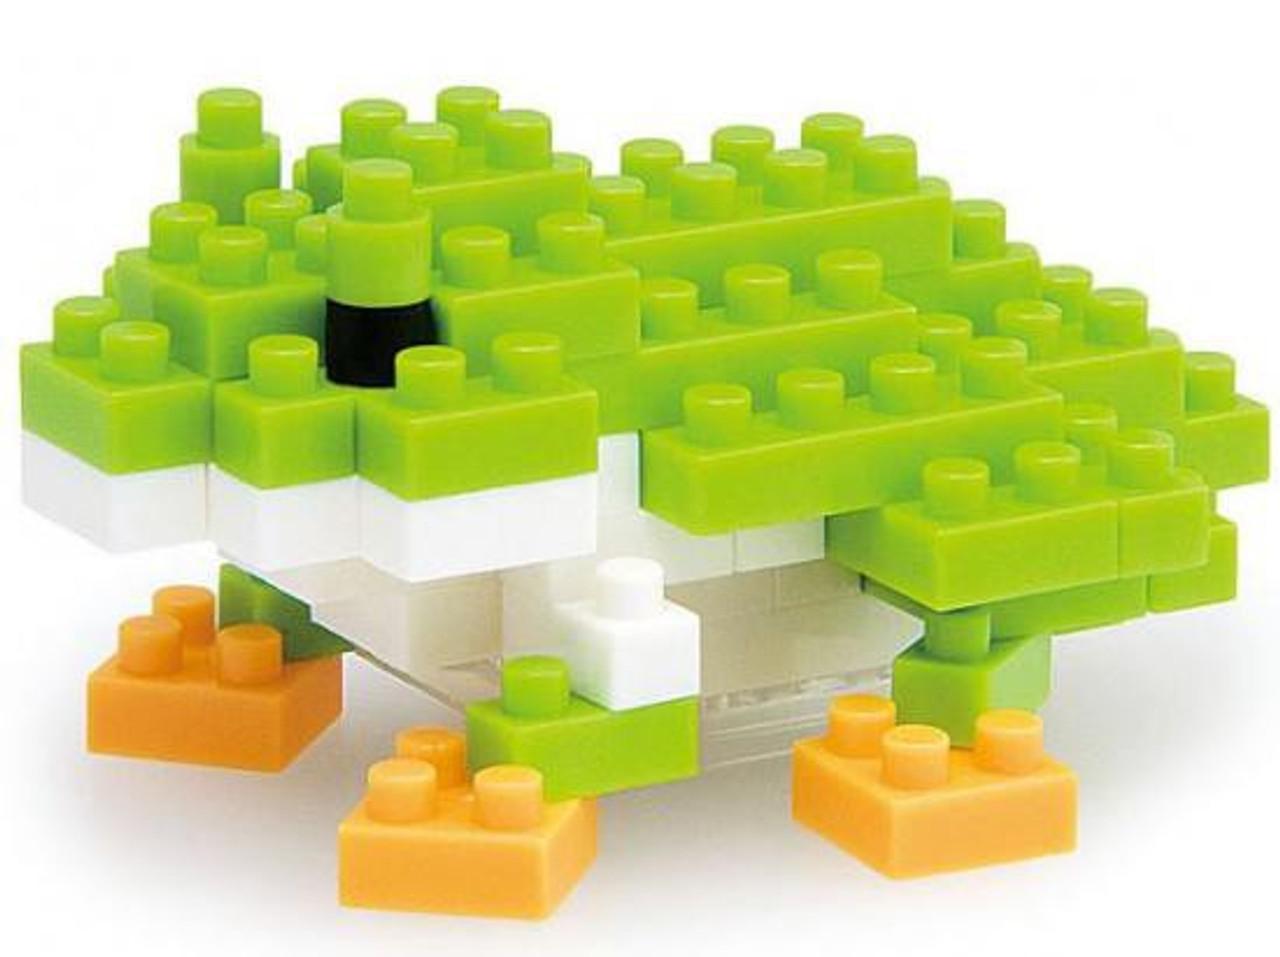 Nanoblock Micro-Sized Building Block Japanese Tree Frog Figure Set